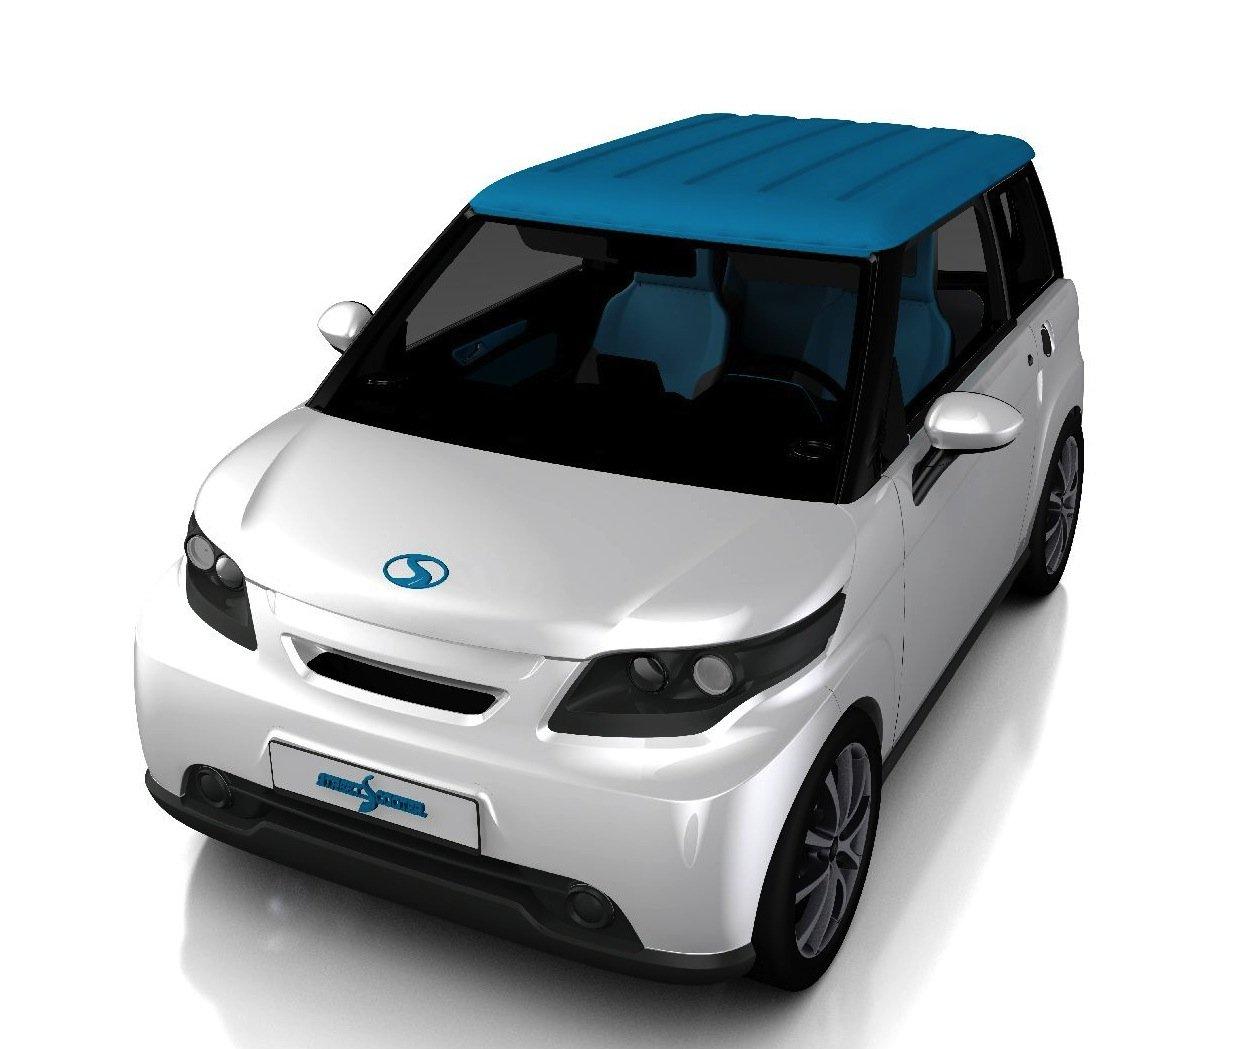 Das kleine E-Familienauto Compact gibt es bislang nur als Prototyp.